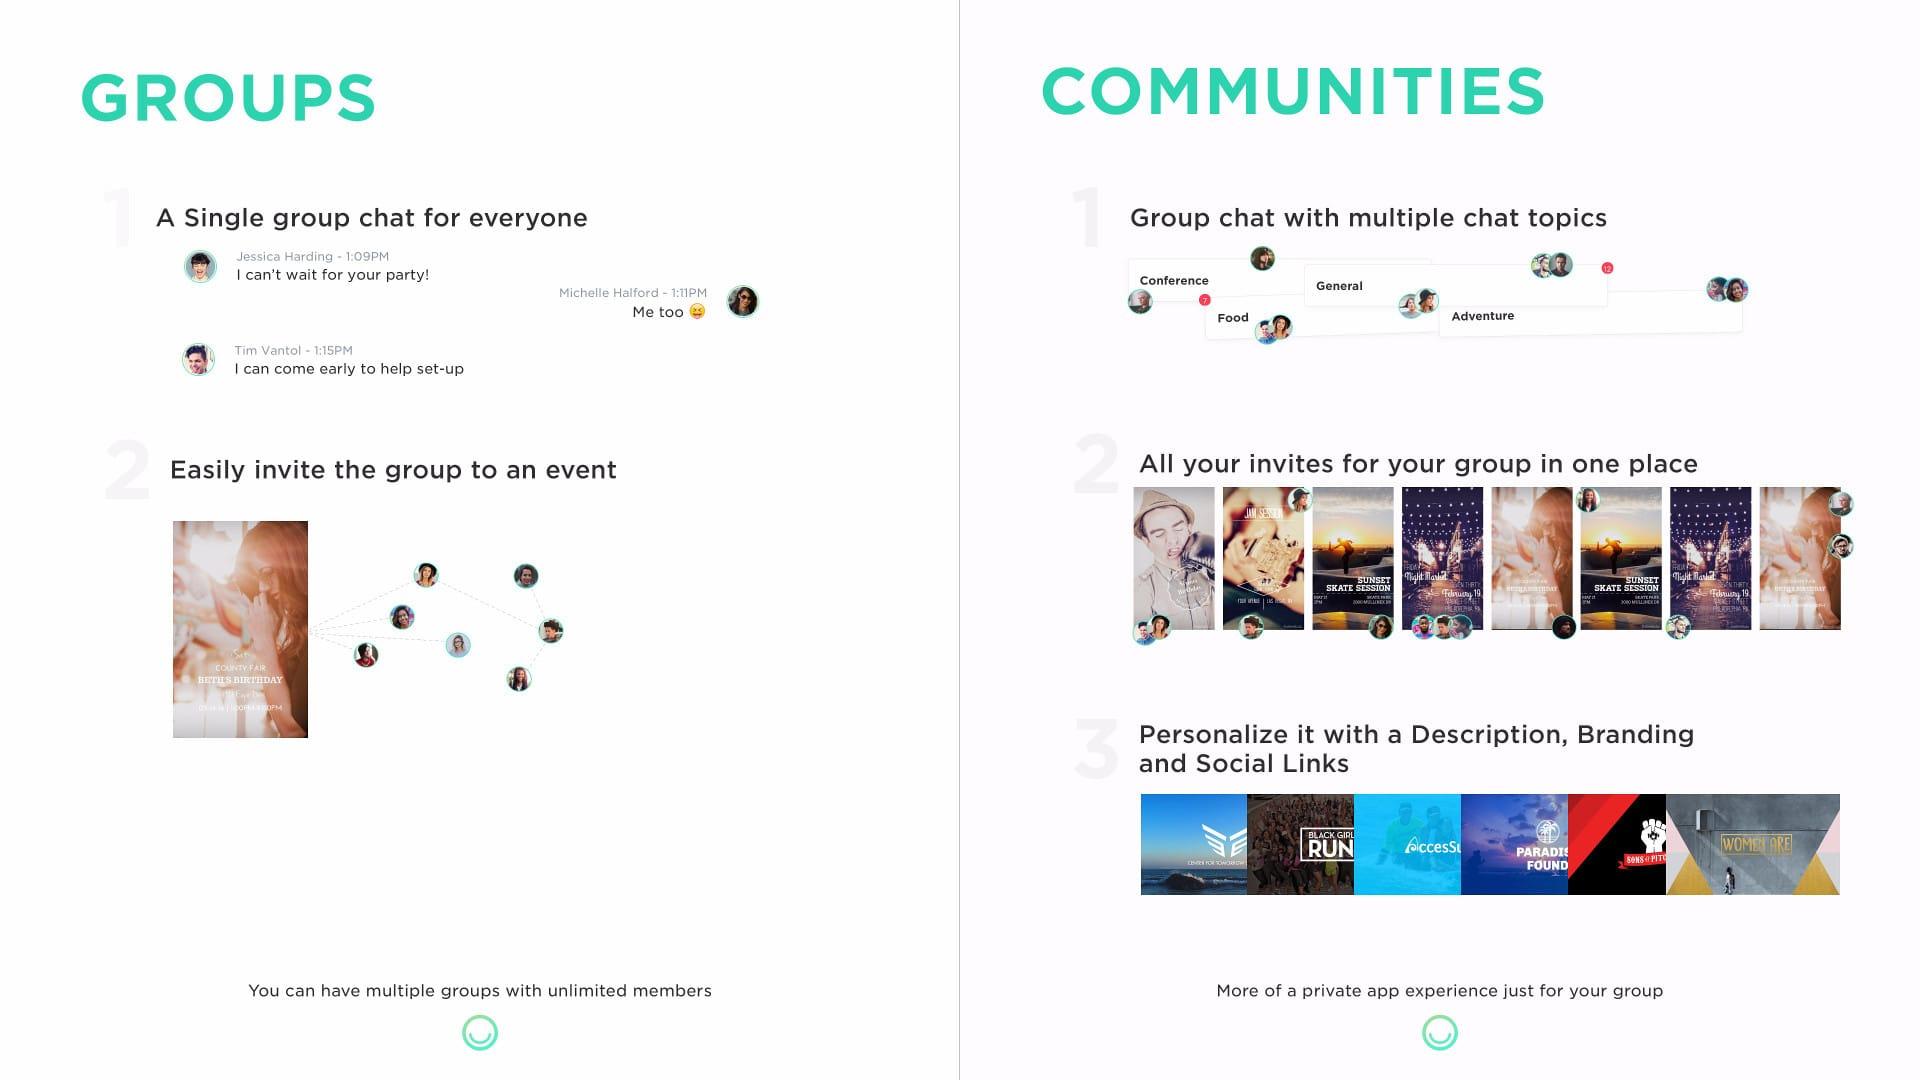 Groups vs communities